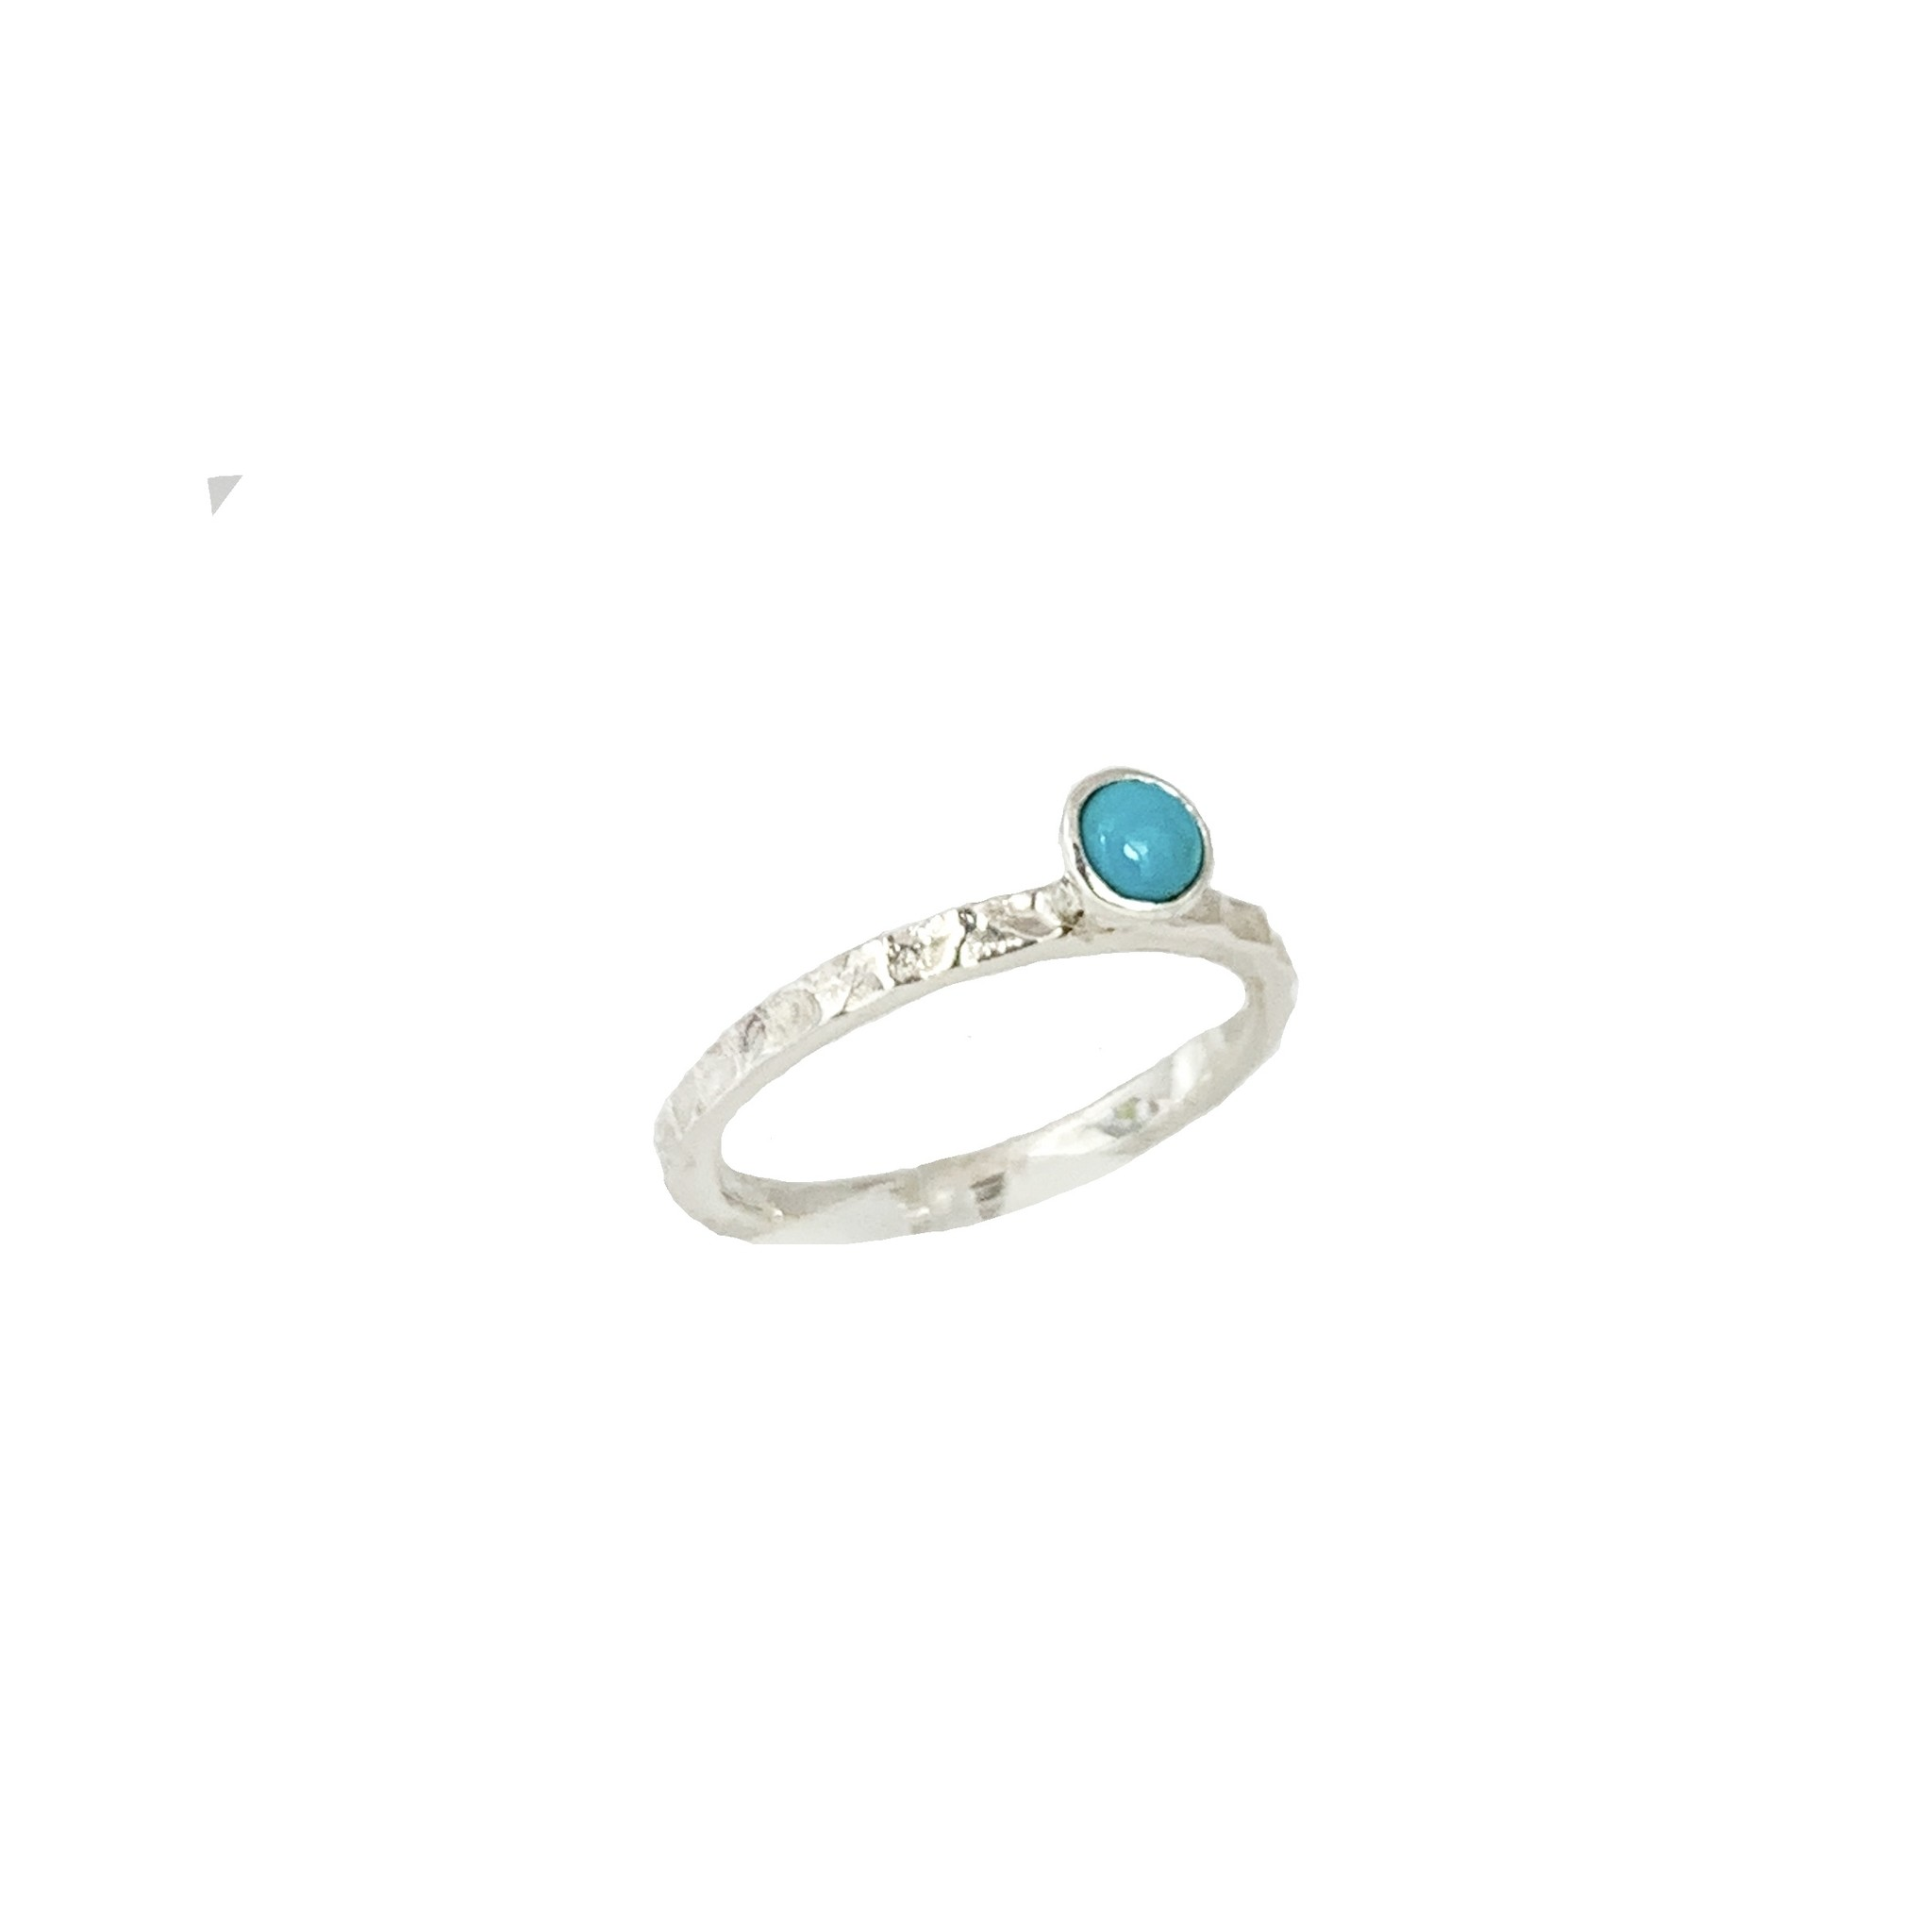 Kiliaan Jewelry Stackable rings Turkoois